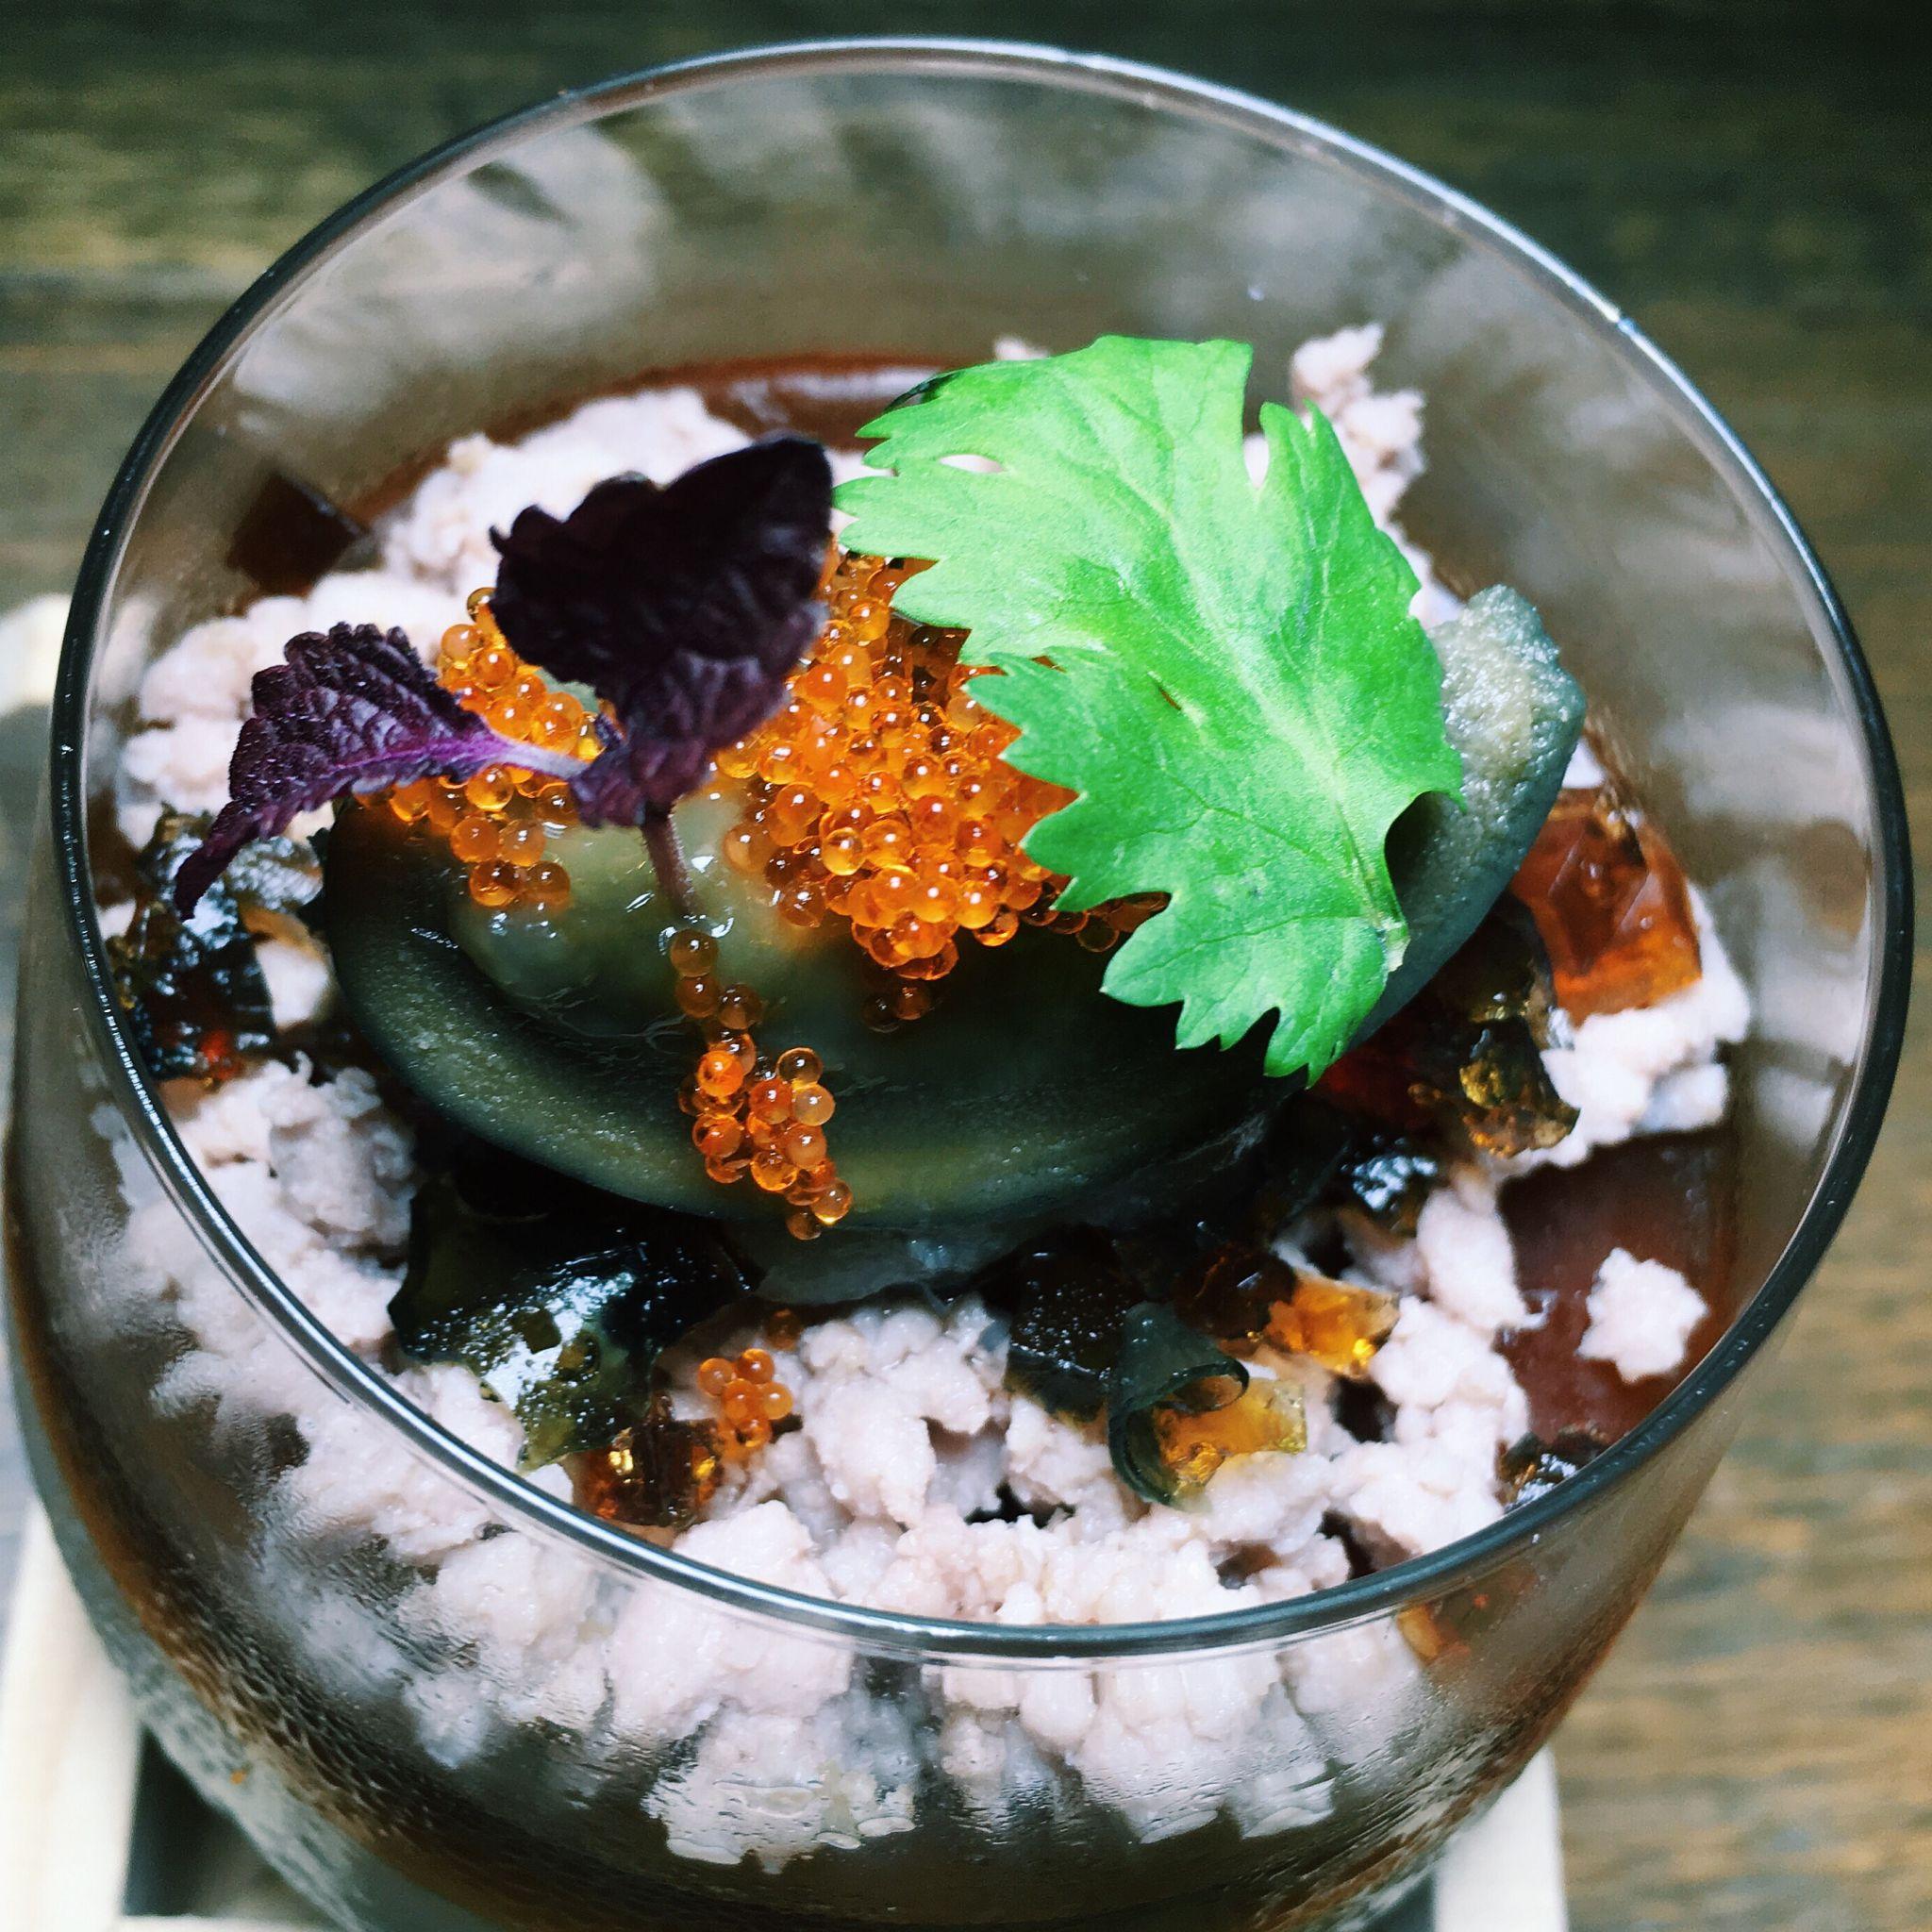 Savoury Soya Milk Panna Cotta with Shoyu Jelly, Oriental Minced Pork and Century Egg - The East Bureau